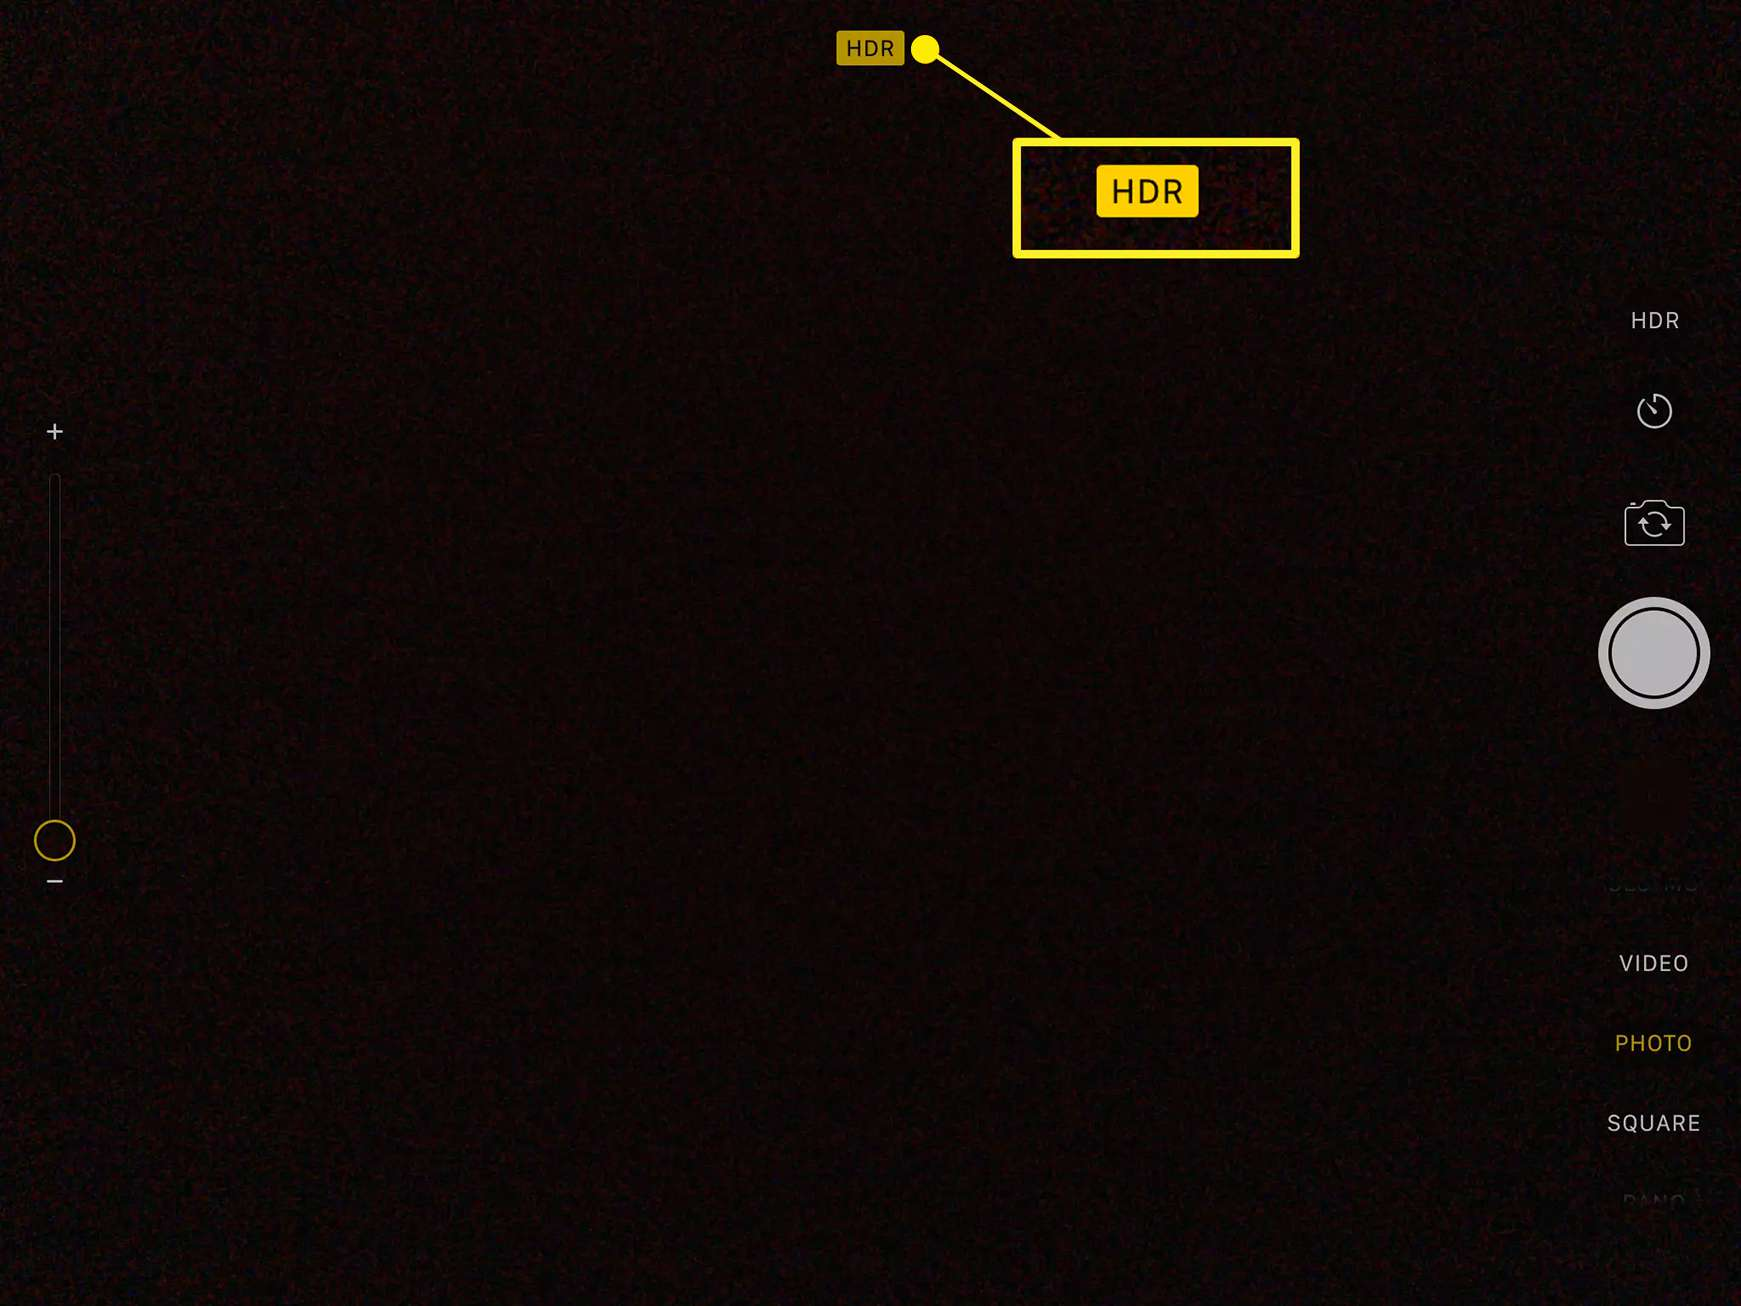 iPad Camera app showing HDR indicator